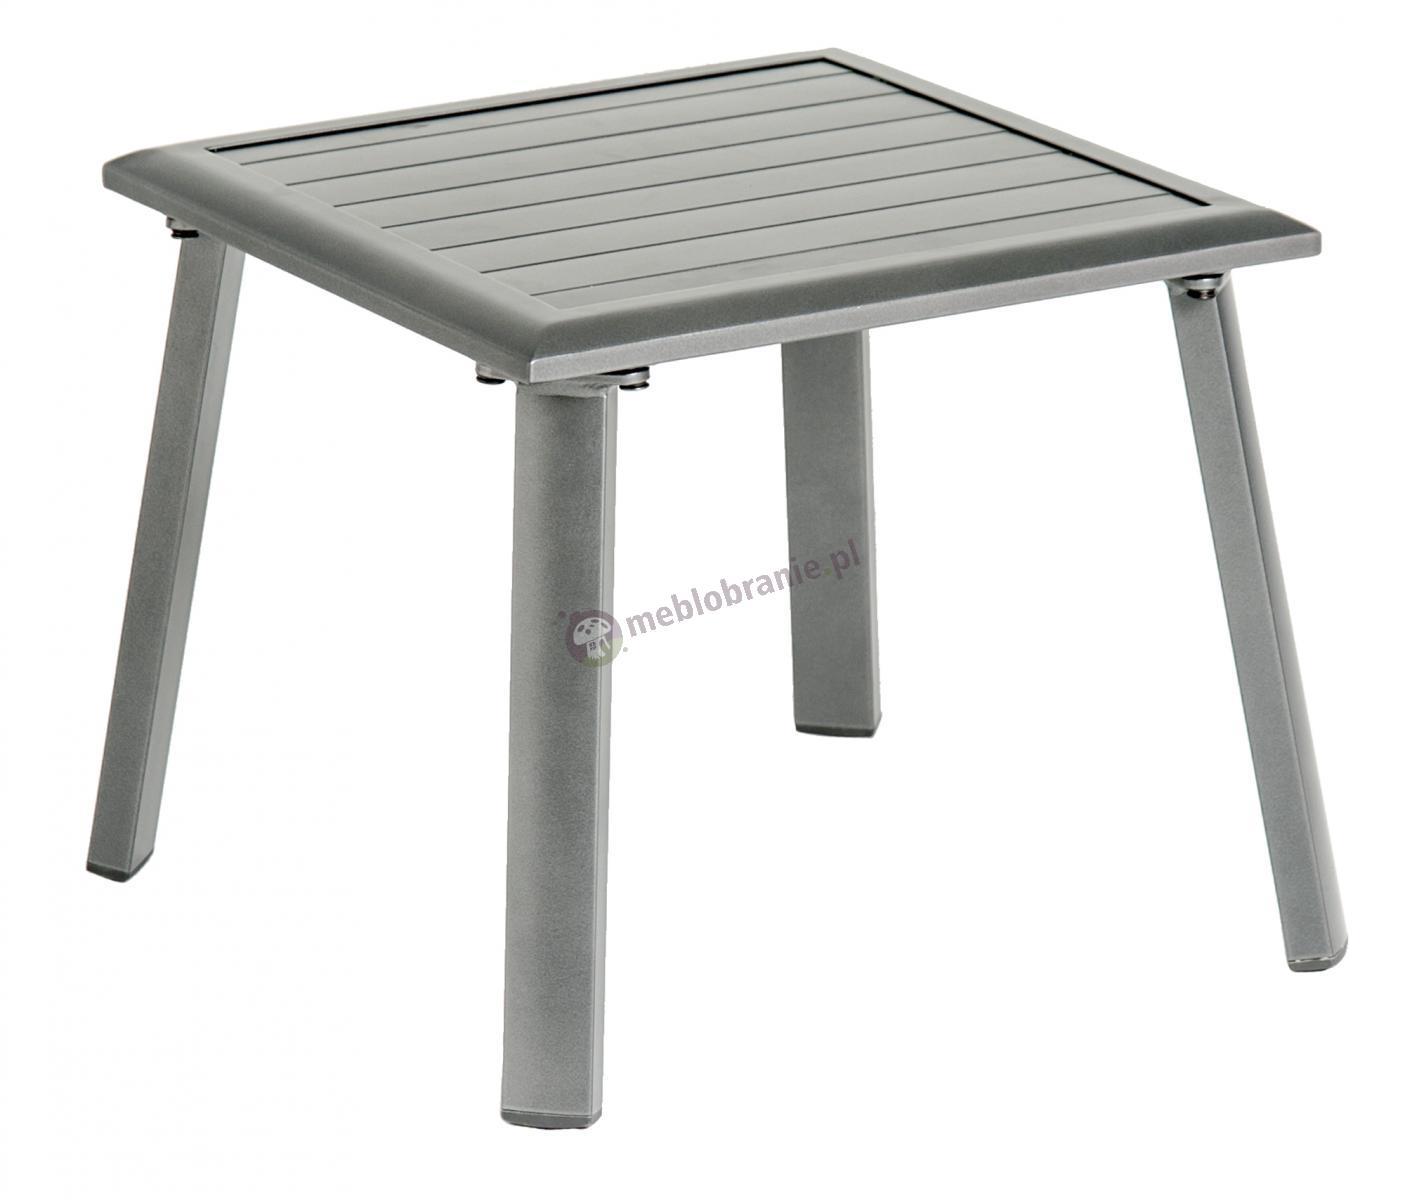 Alexander Rose Portofino Lite aluminiowy taboret ogrodowy 471